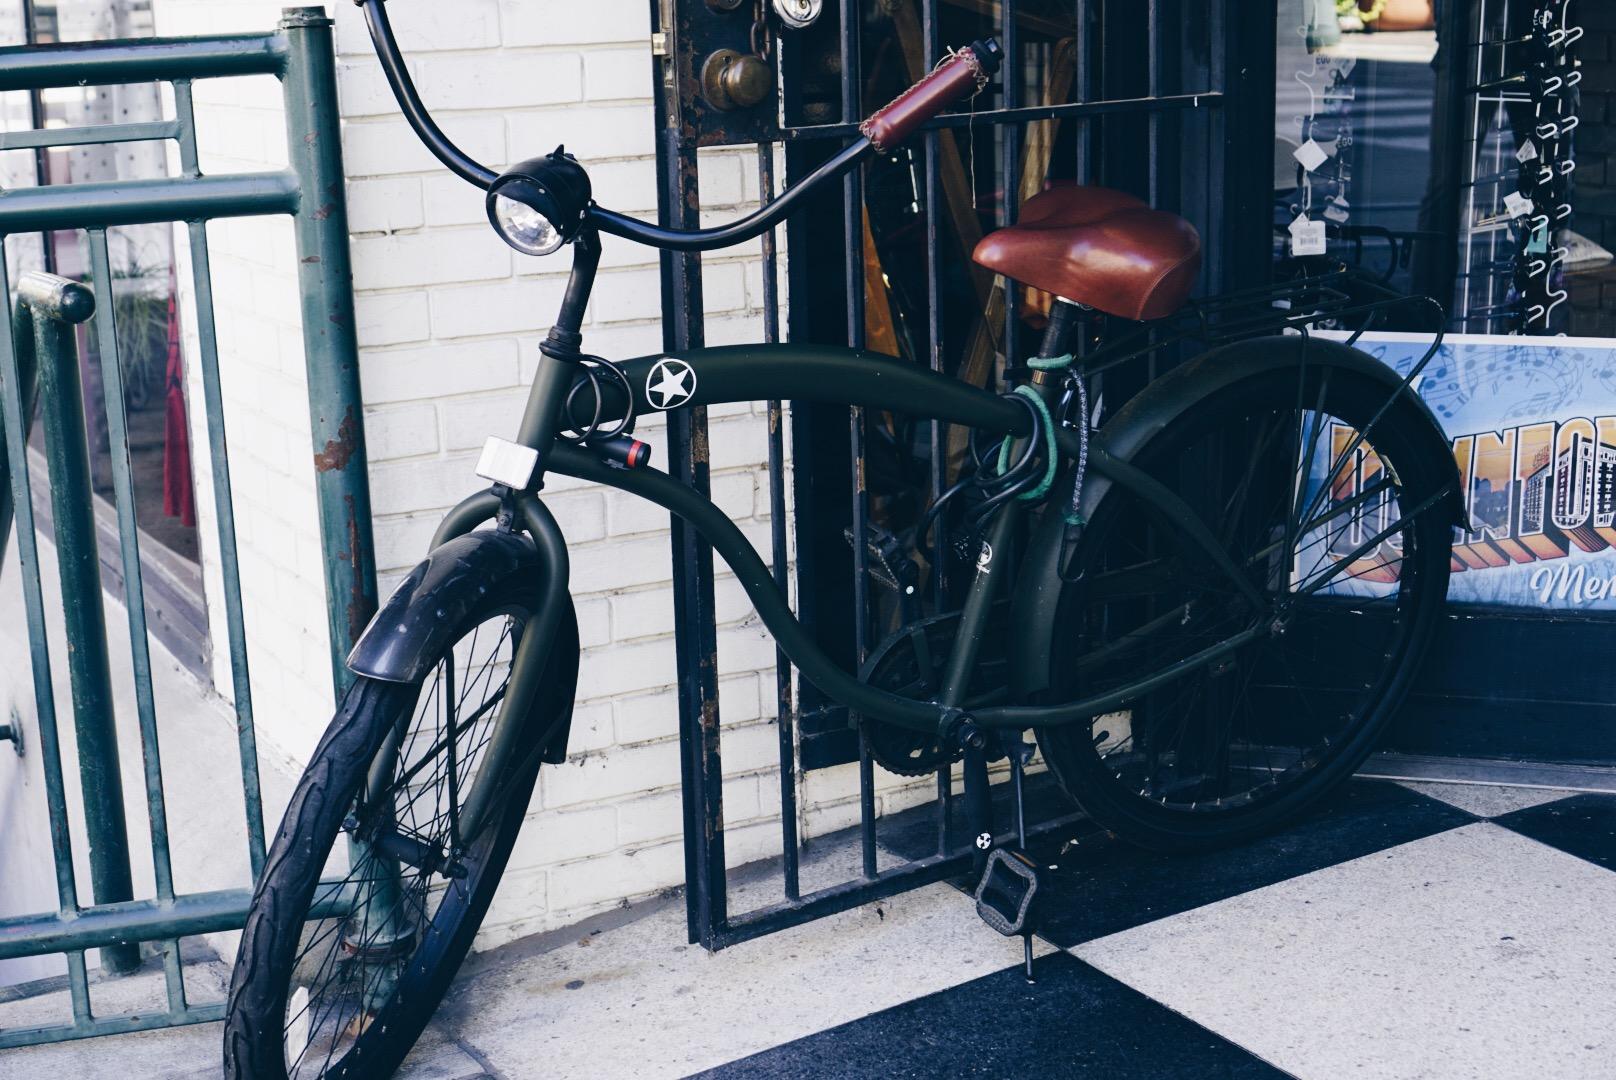 Random cool bike.